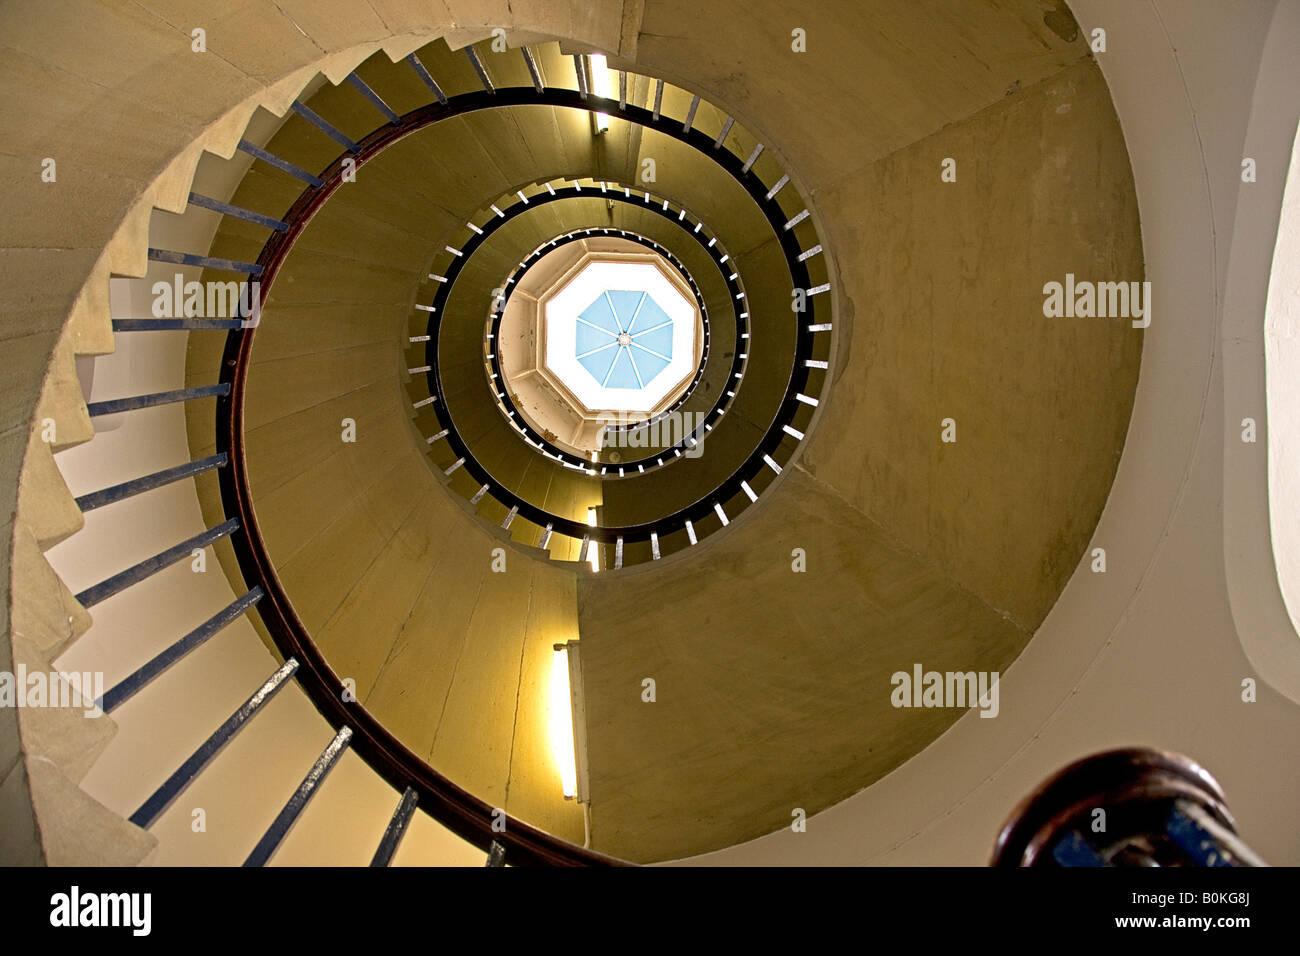 Spiral staircase. St john's college. Cambridge. - Stock Image